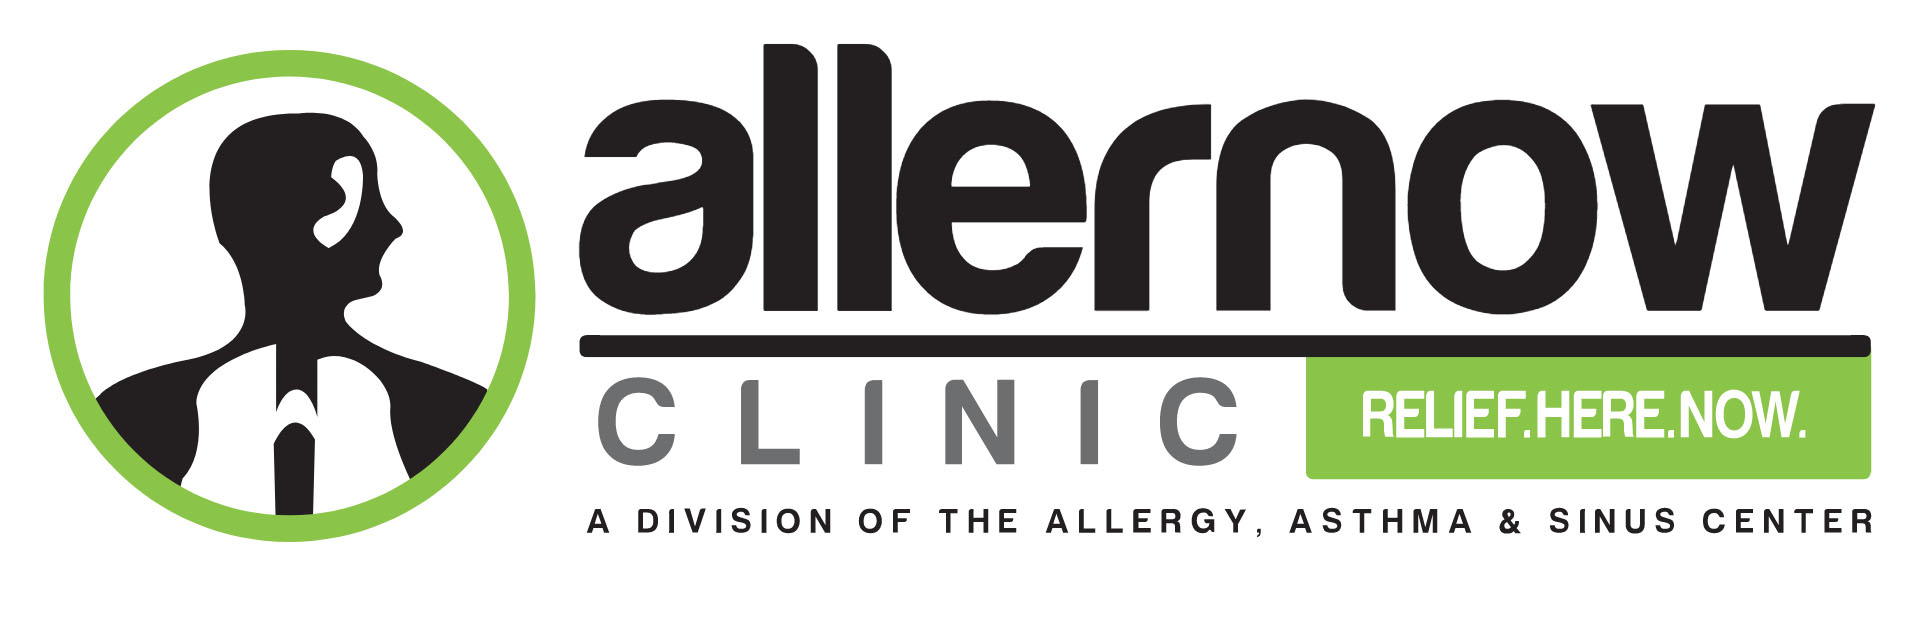 Allernow Clinic